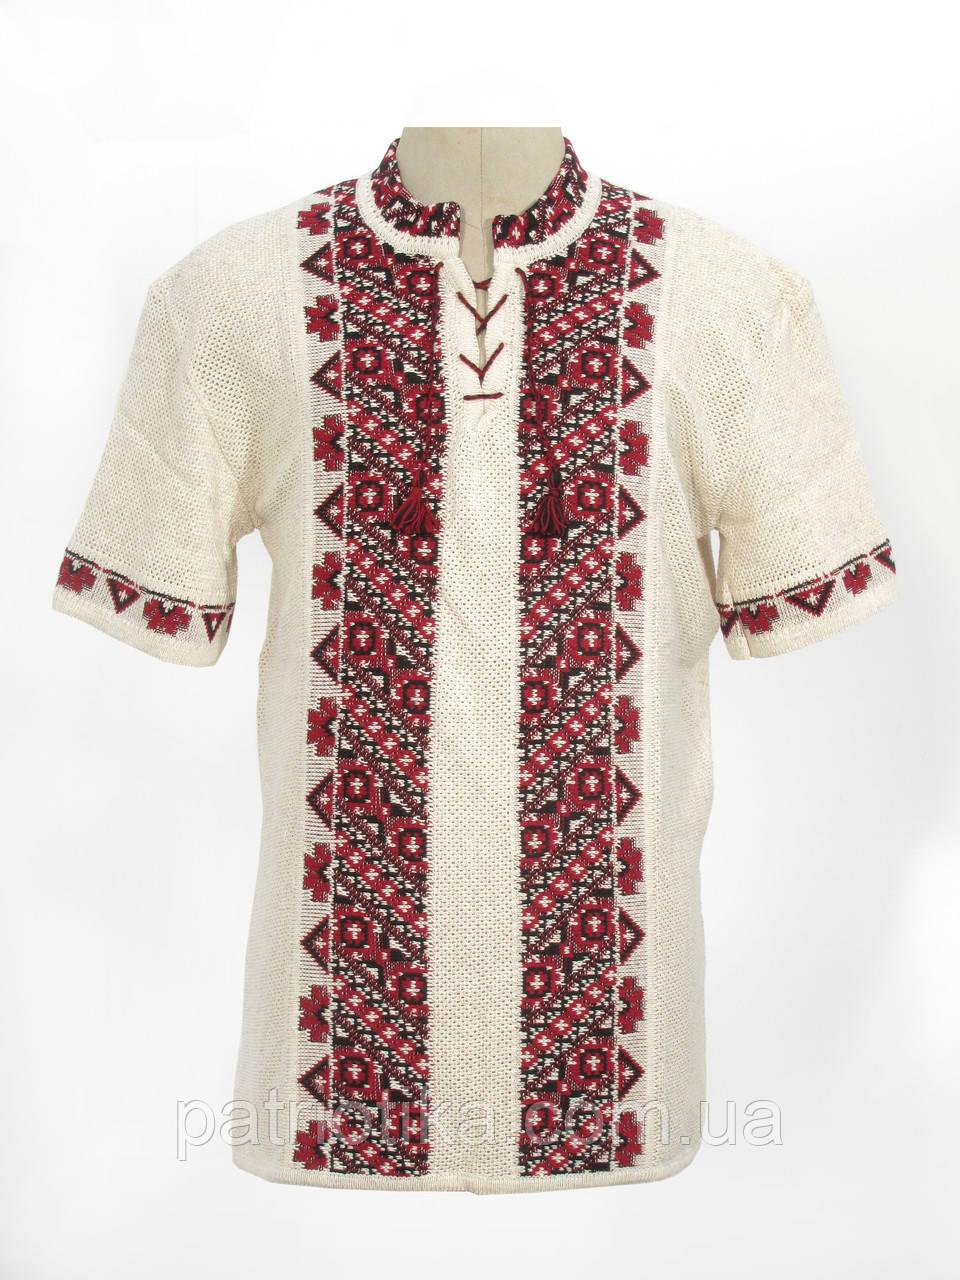 Вязанка черно-красная Андрей | В'язанка чорно-червона Андрій